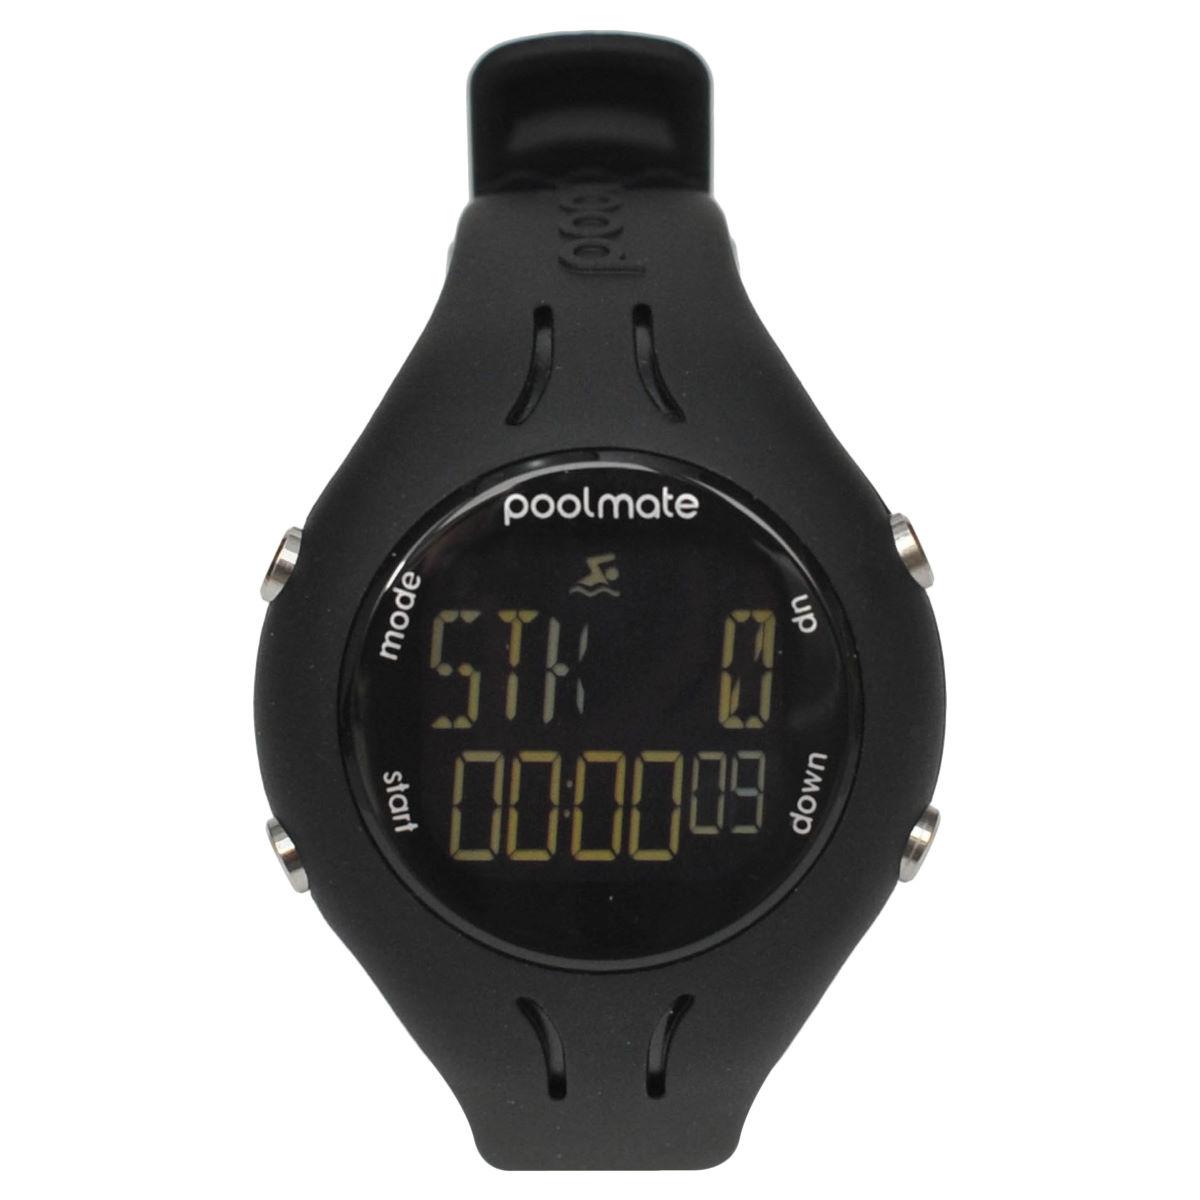 Reloj de natación Swimovate Pool Mate 2 - Relojes deportivos